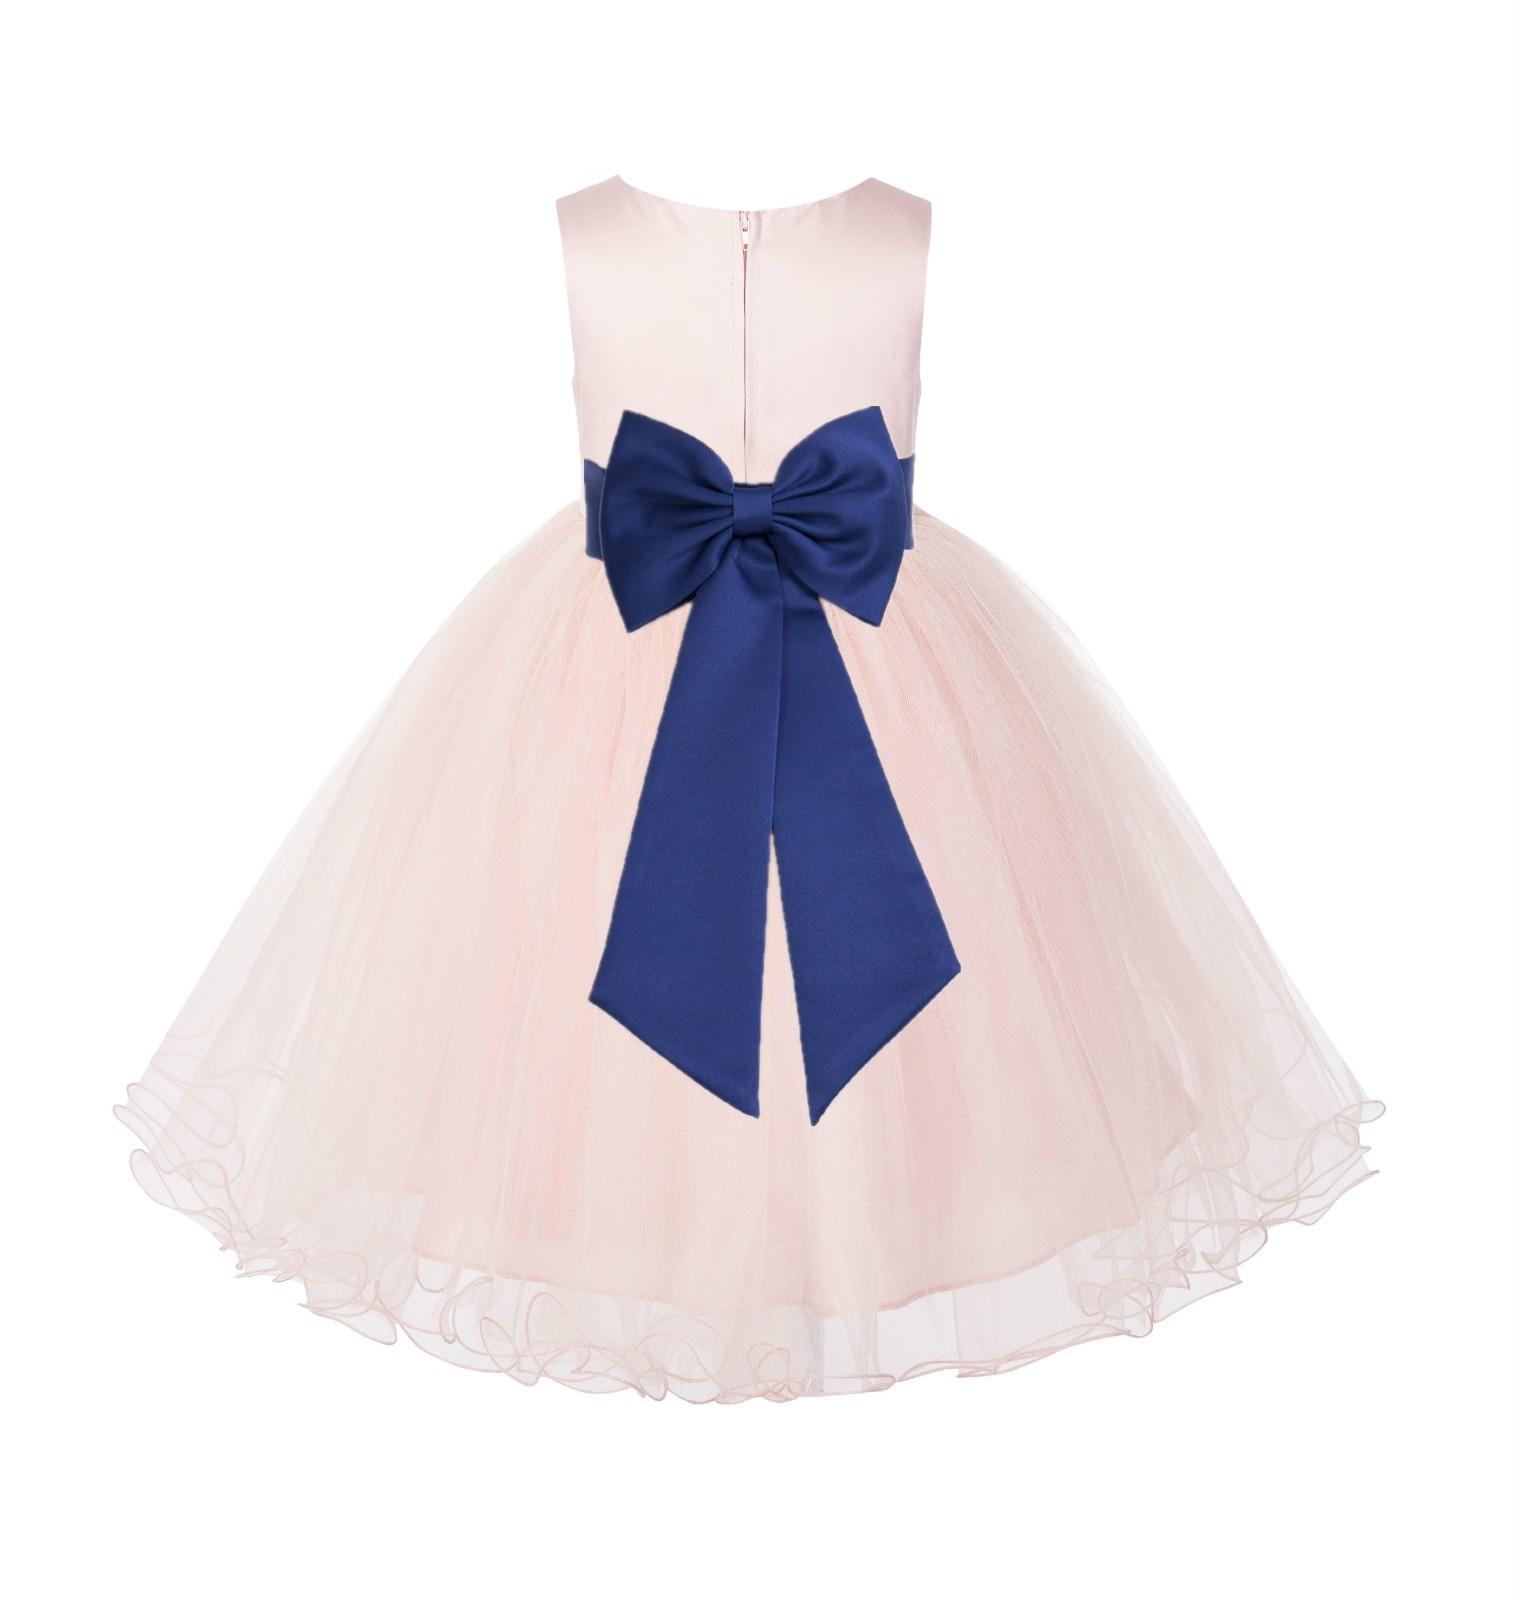 Blush PInk / Navy Tulle Rattail Edge Flower Girl Dress Wedding Bridesmaid 829T